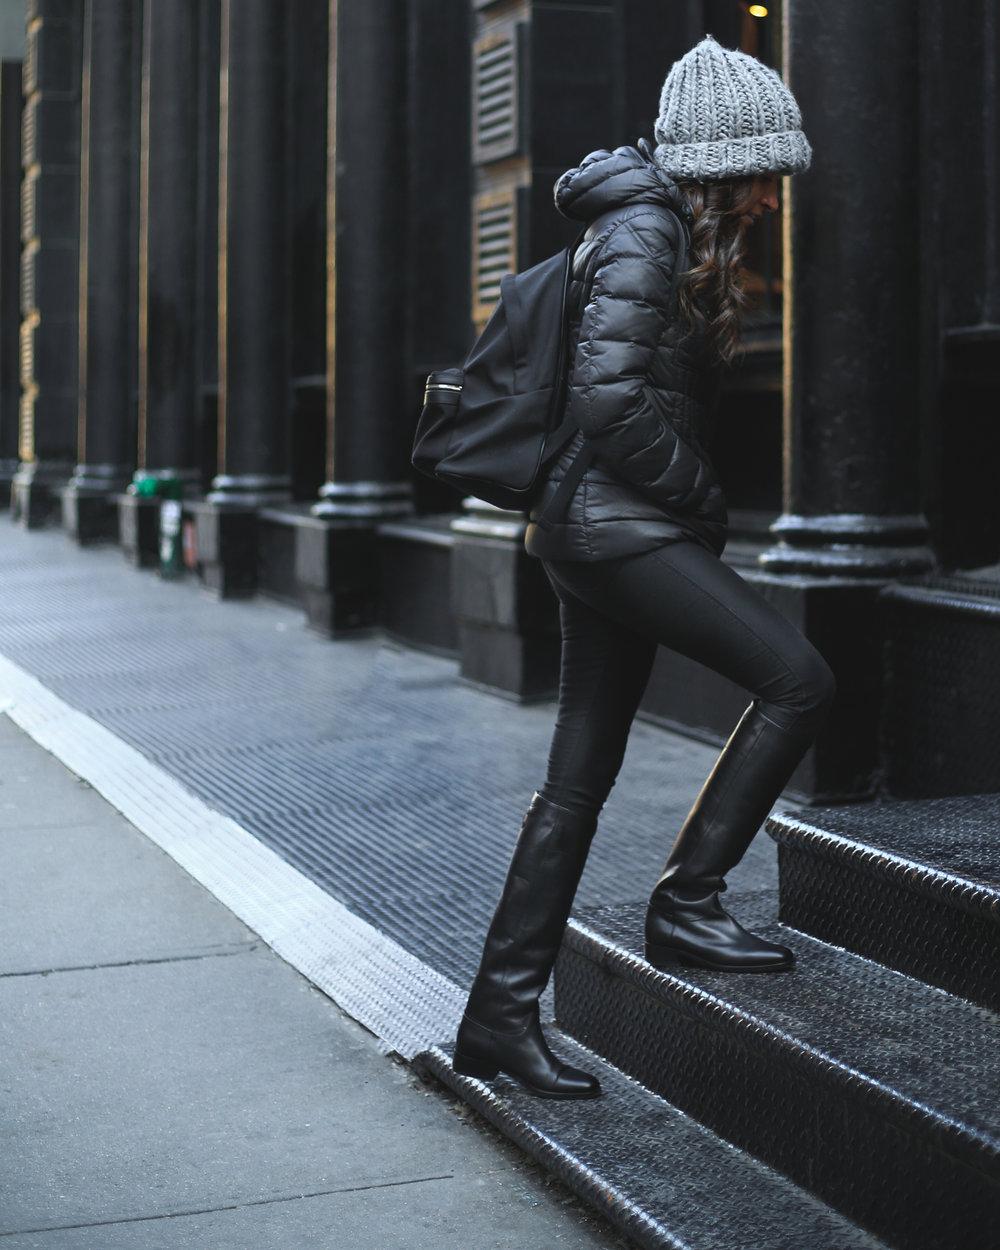 Krys wearing her black canvas Saint Laurent backpack.